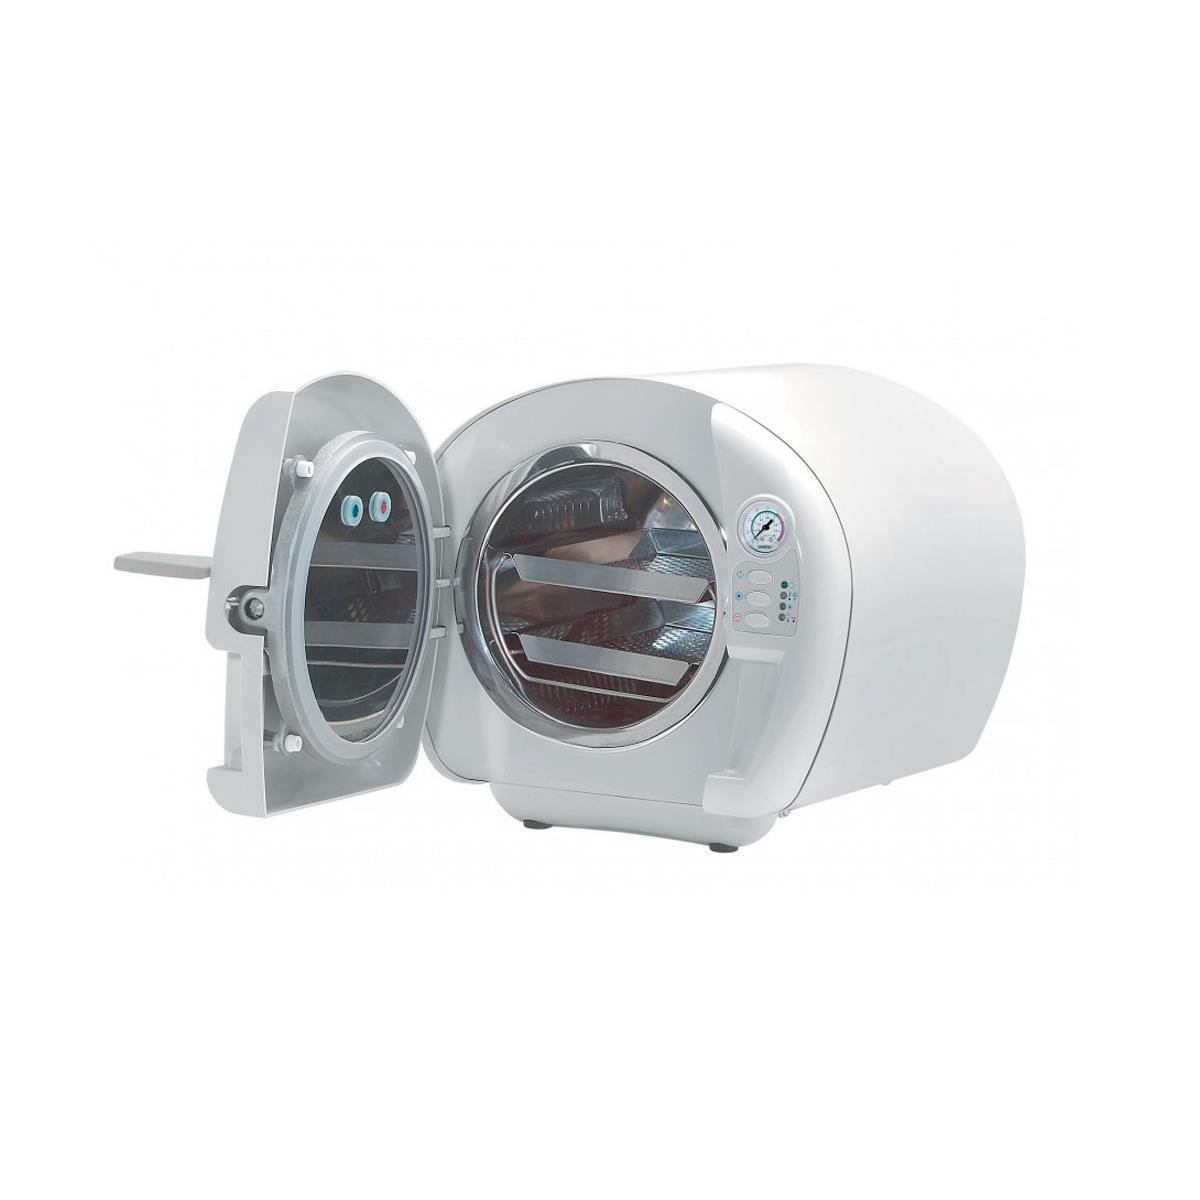 Autoclave Bioclave Aço Inox 21L - Bivolt - Gnatus